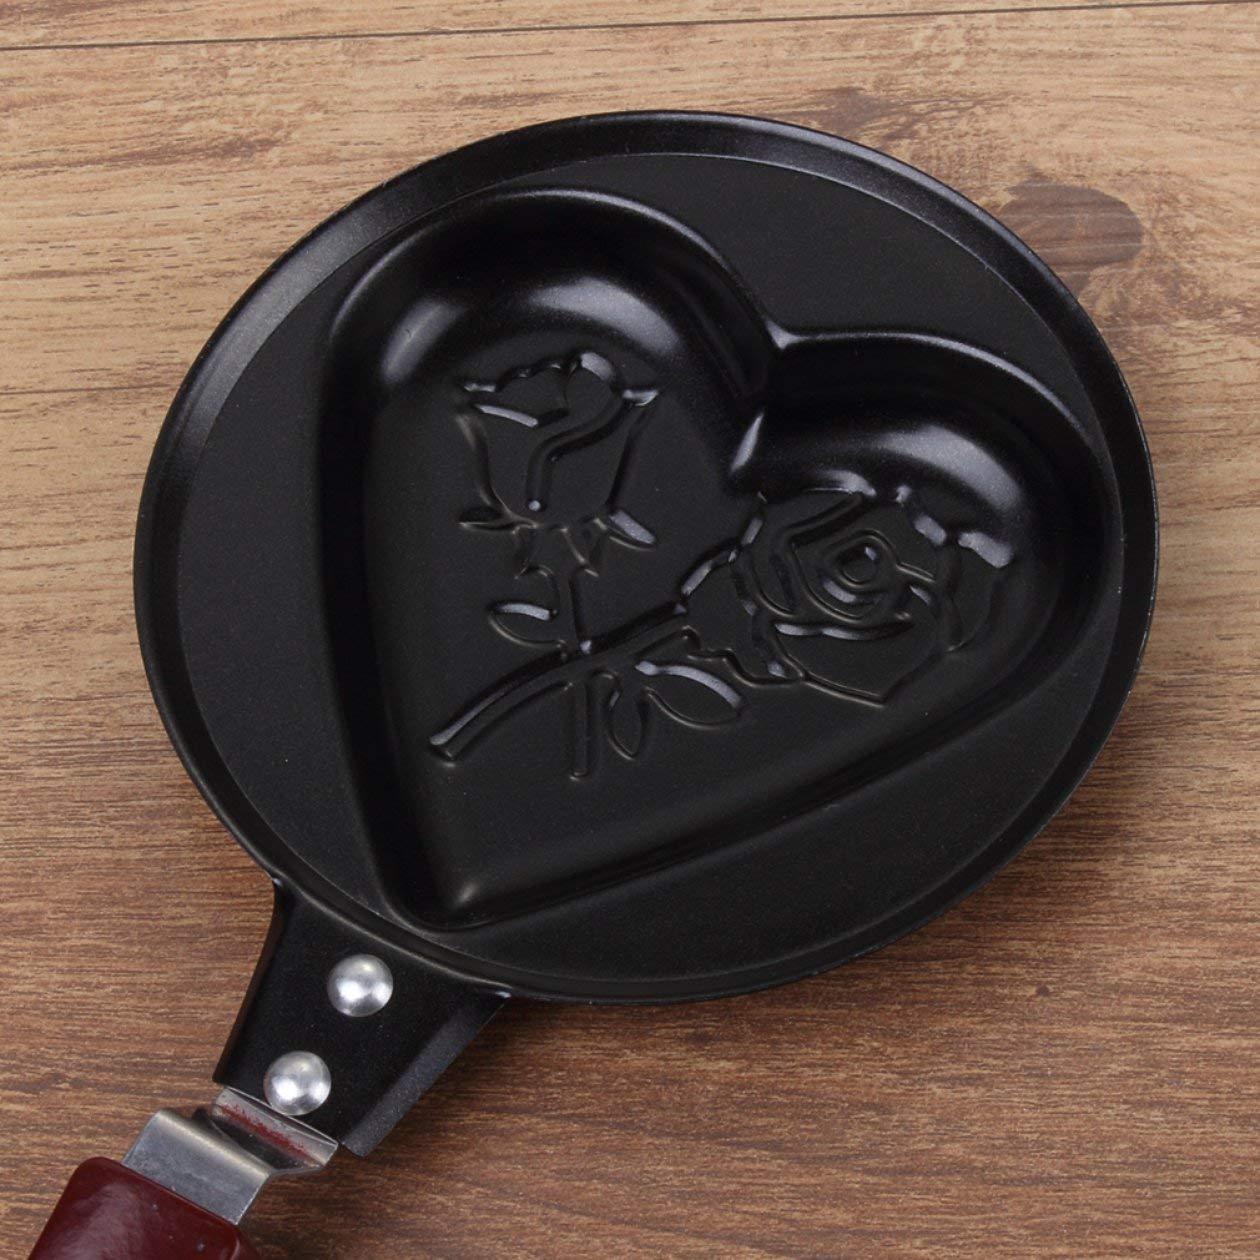 L IFEN Hogar Cocina Accesorios para Hornear F/ácil de Limpiar Estante de enfriamiento Antiadherente Rejilla de Malla Hornear Galleta Galleta Soporte para secar Pasteles Negro